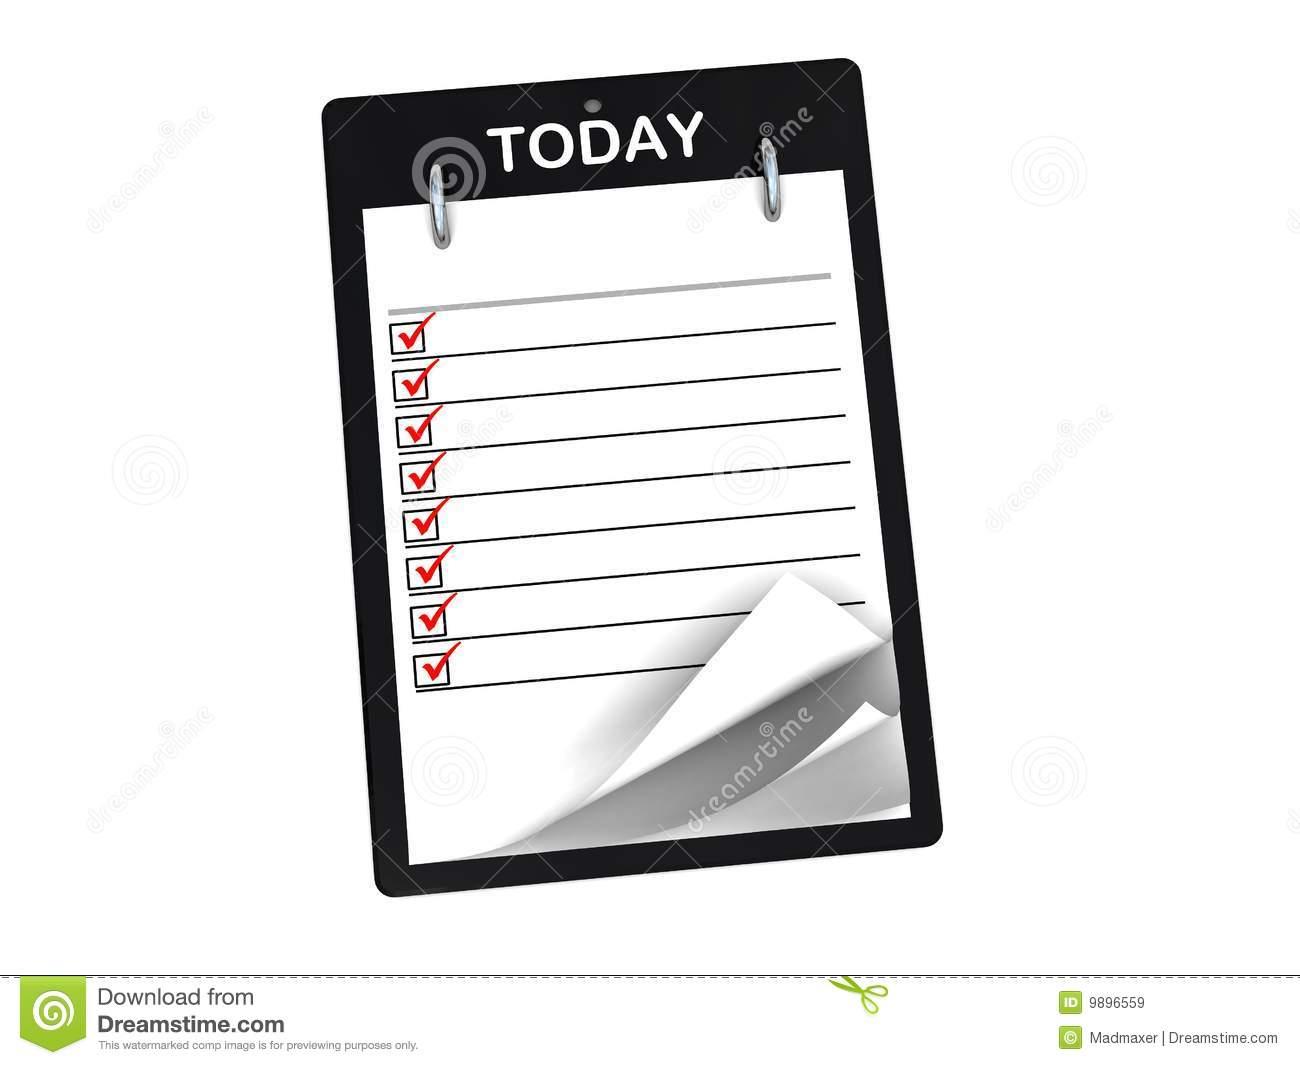 Task List Clipart - Clipart Kid